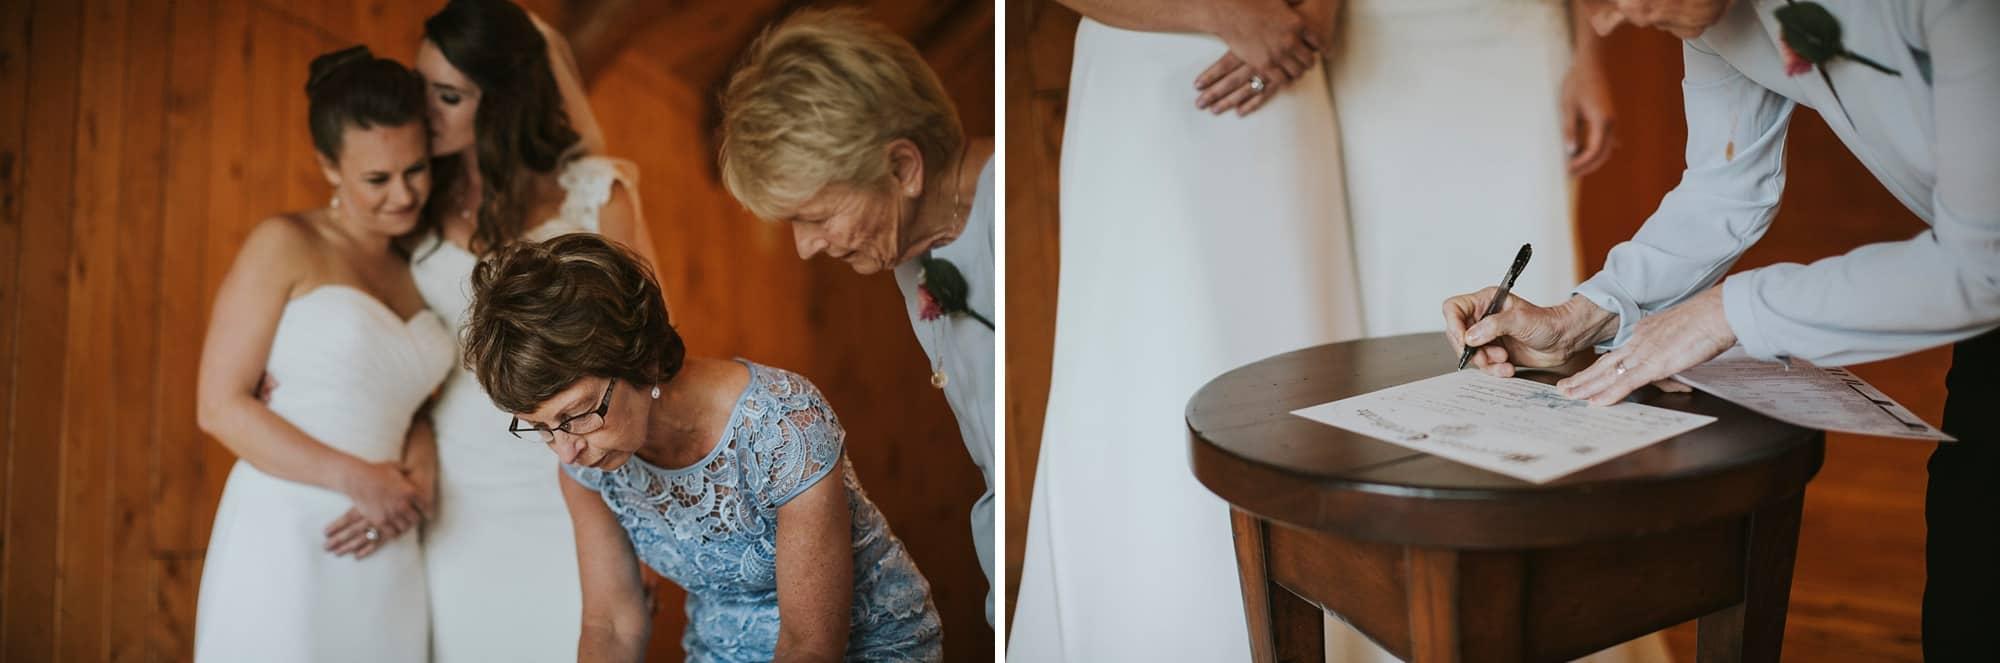 Sara Emily Sunriver Bend Oregon Rustic Lodge Wedding 0051